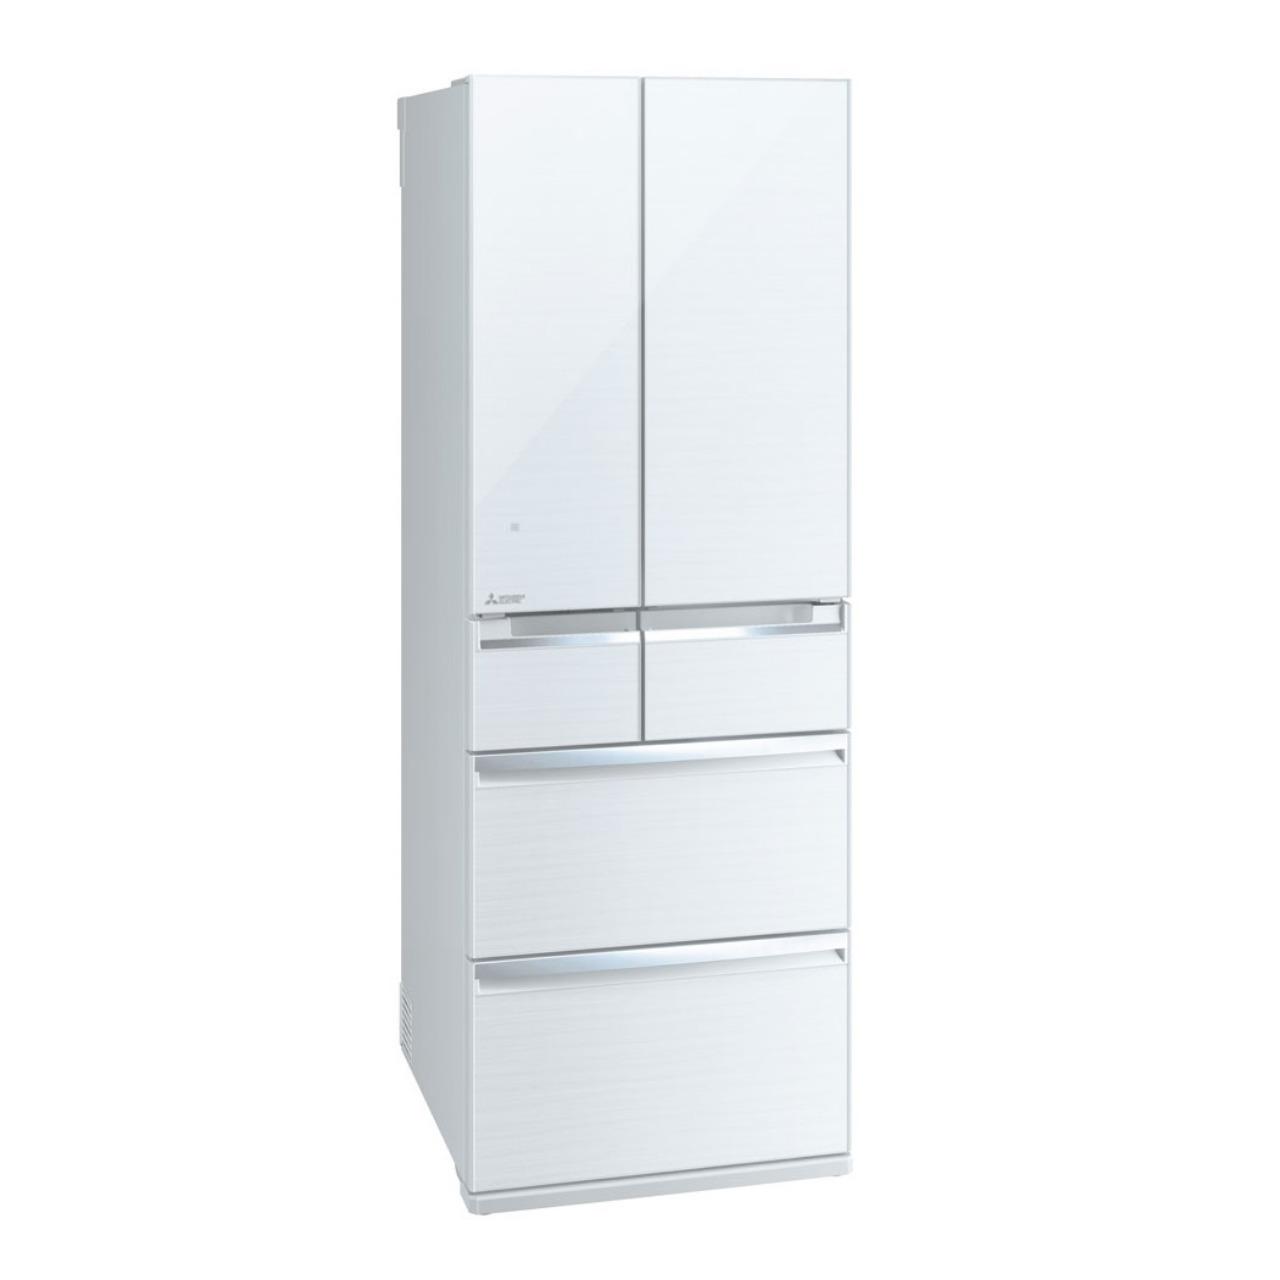 三菱MR-WX52C冷蔵庫